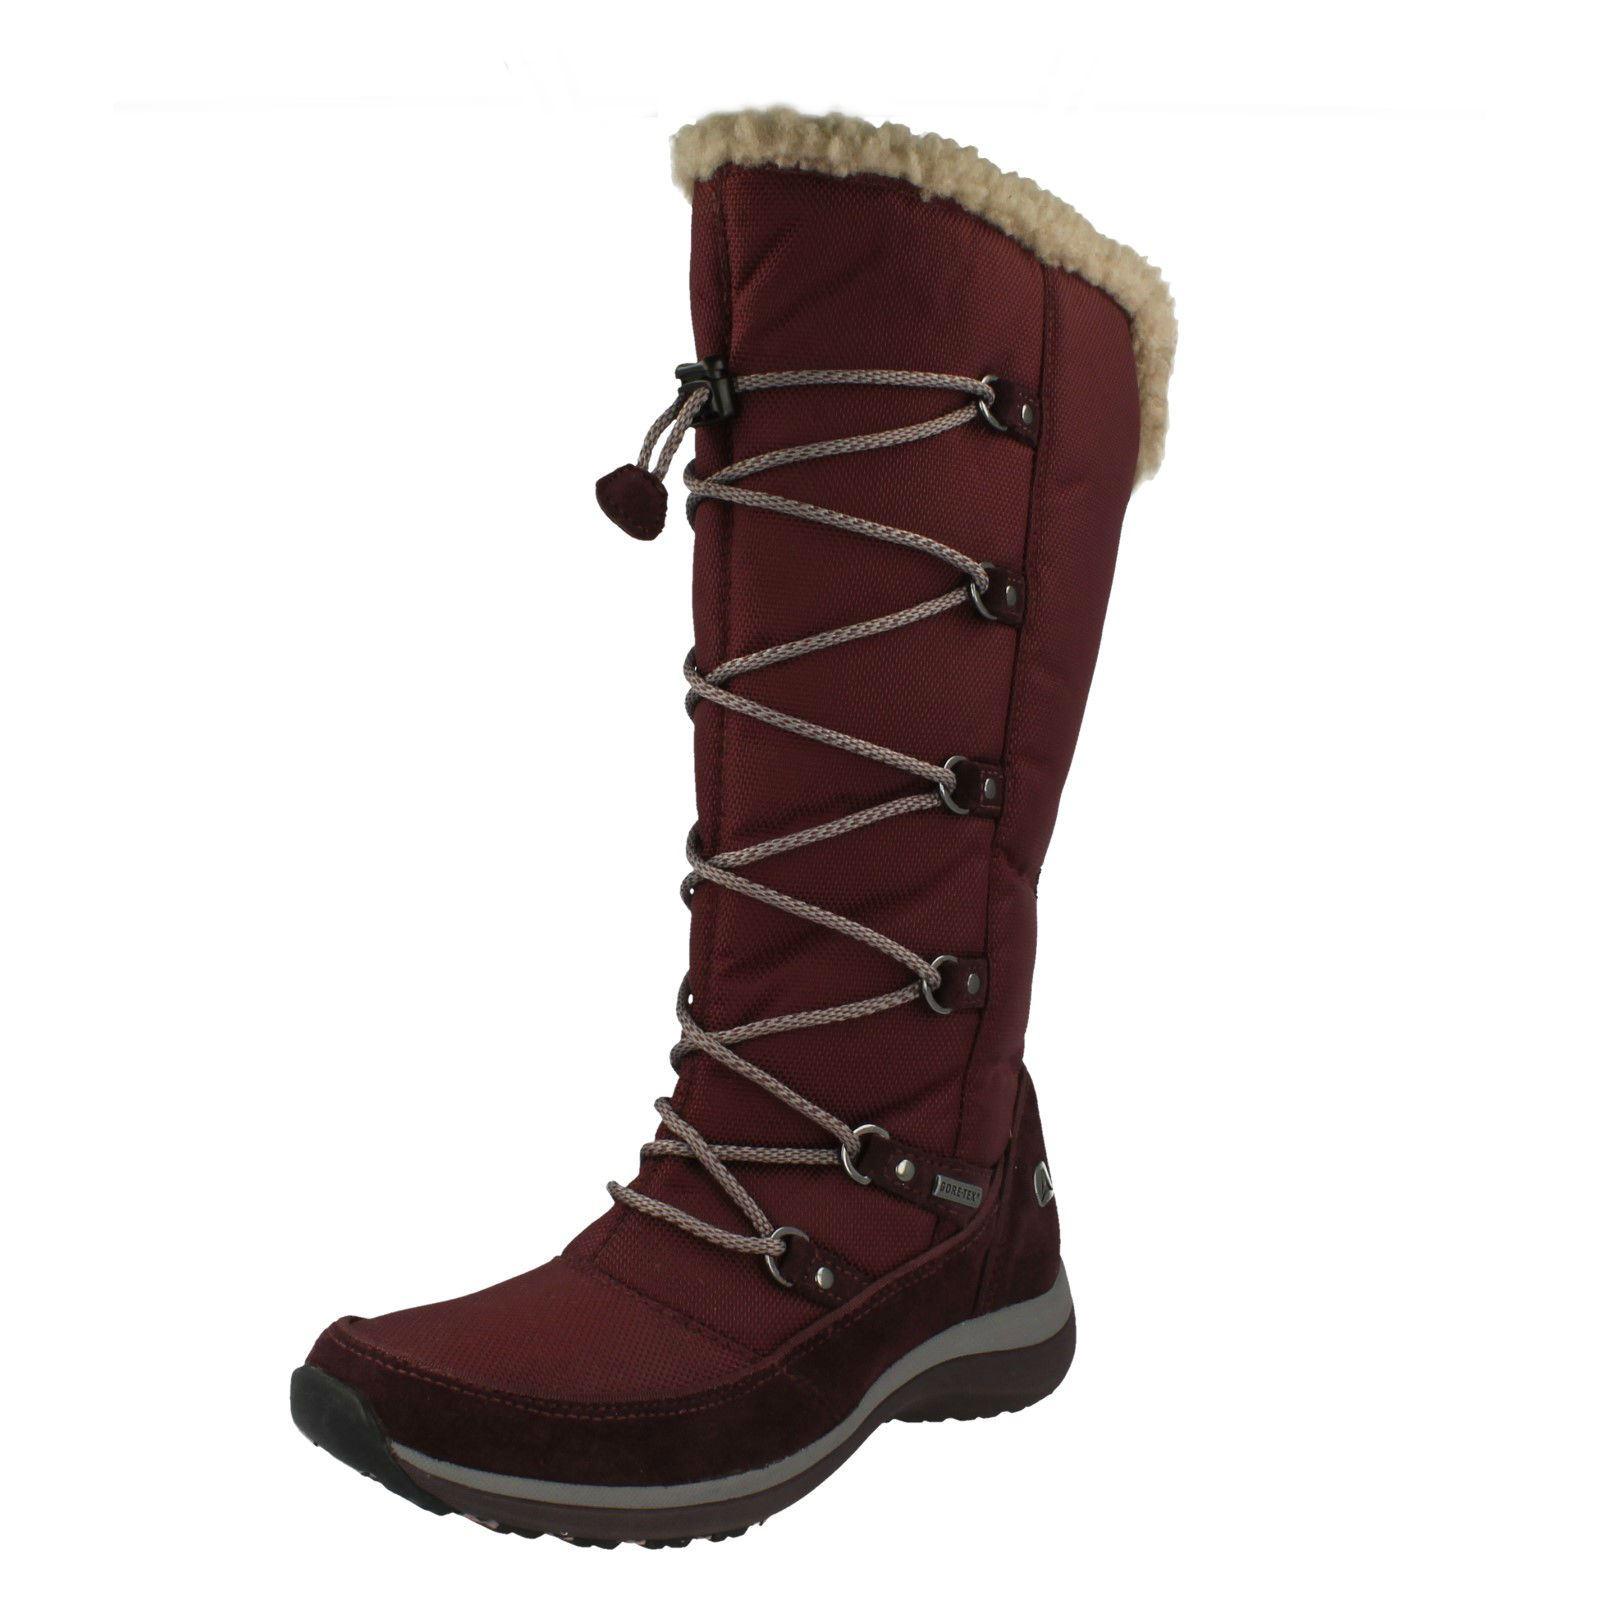 Femmes CLARKS WALK TO Hi hauteur de Mollet Mollet Mollet Gore-Tex Boot | Livraison Immédiate  f5120e